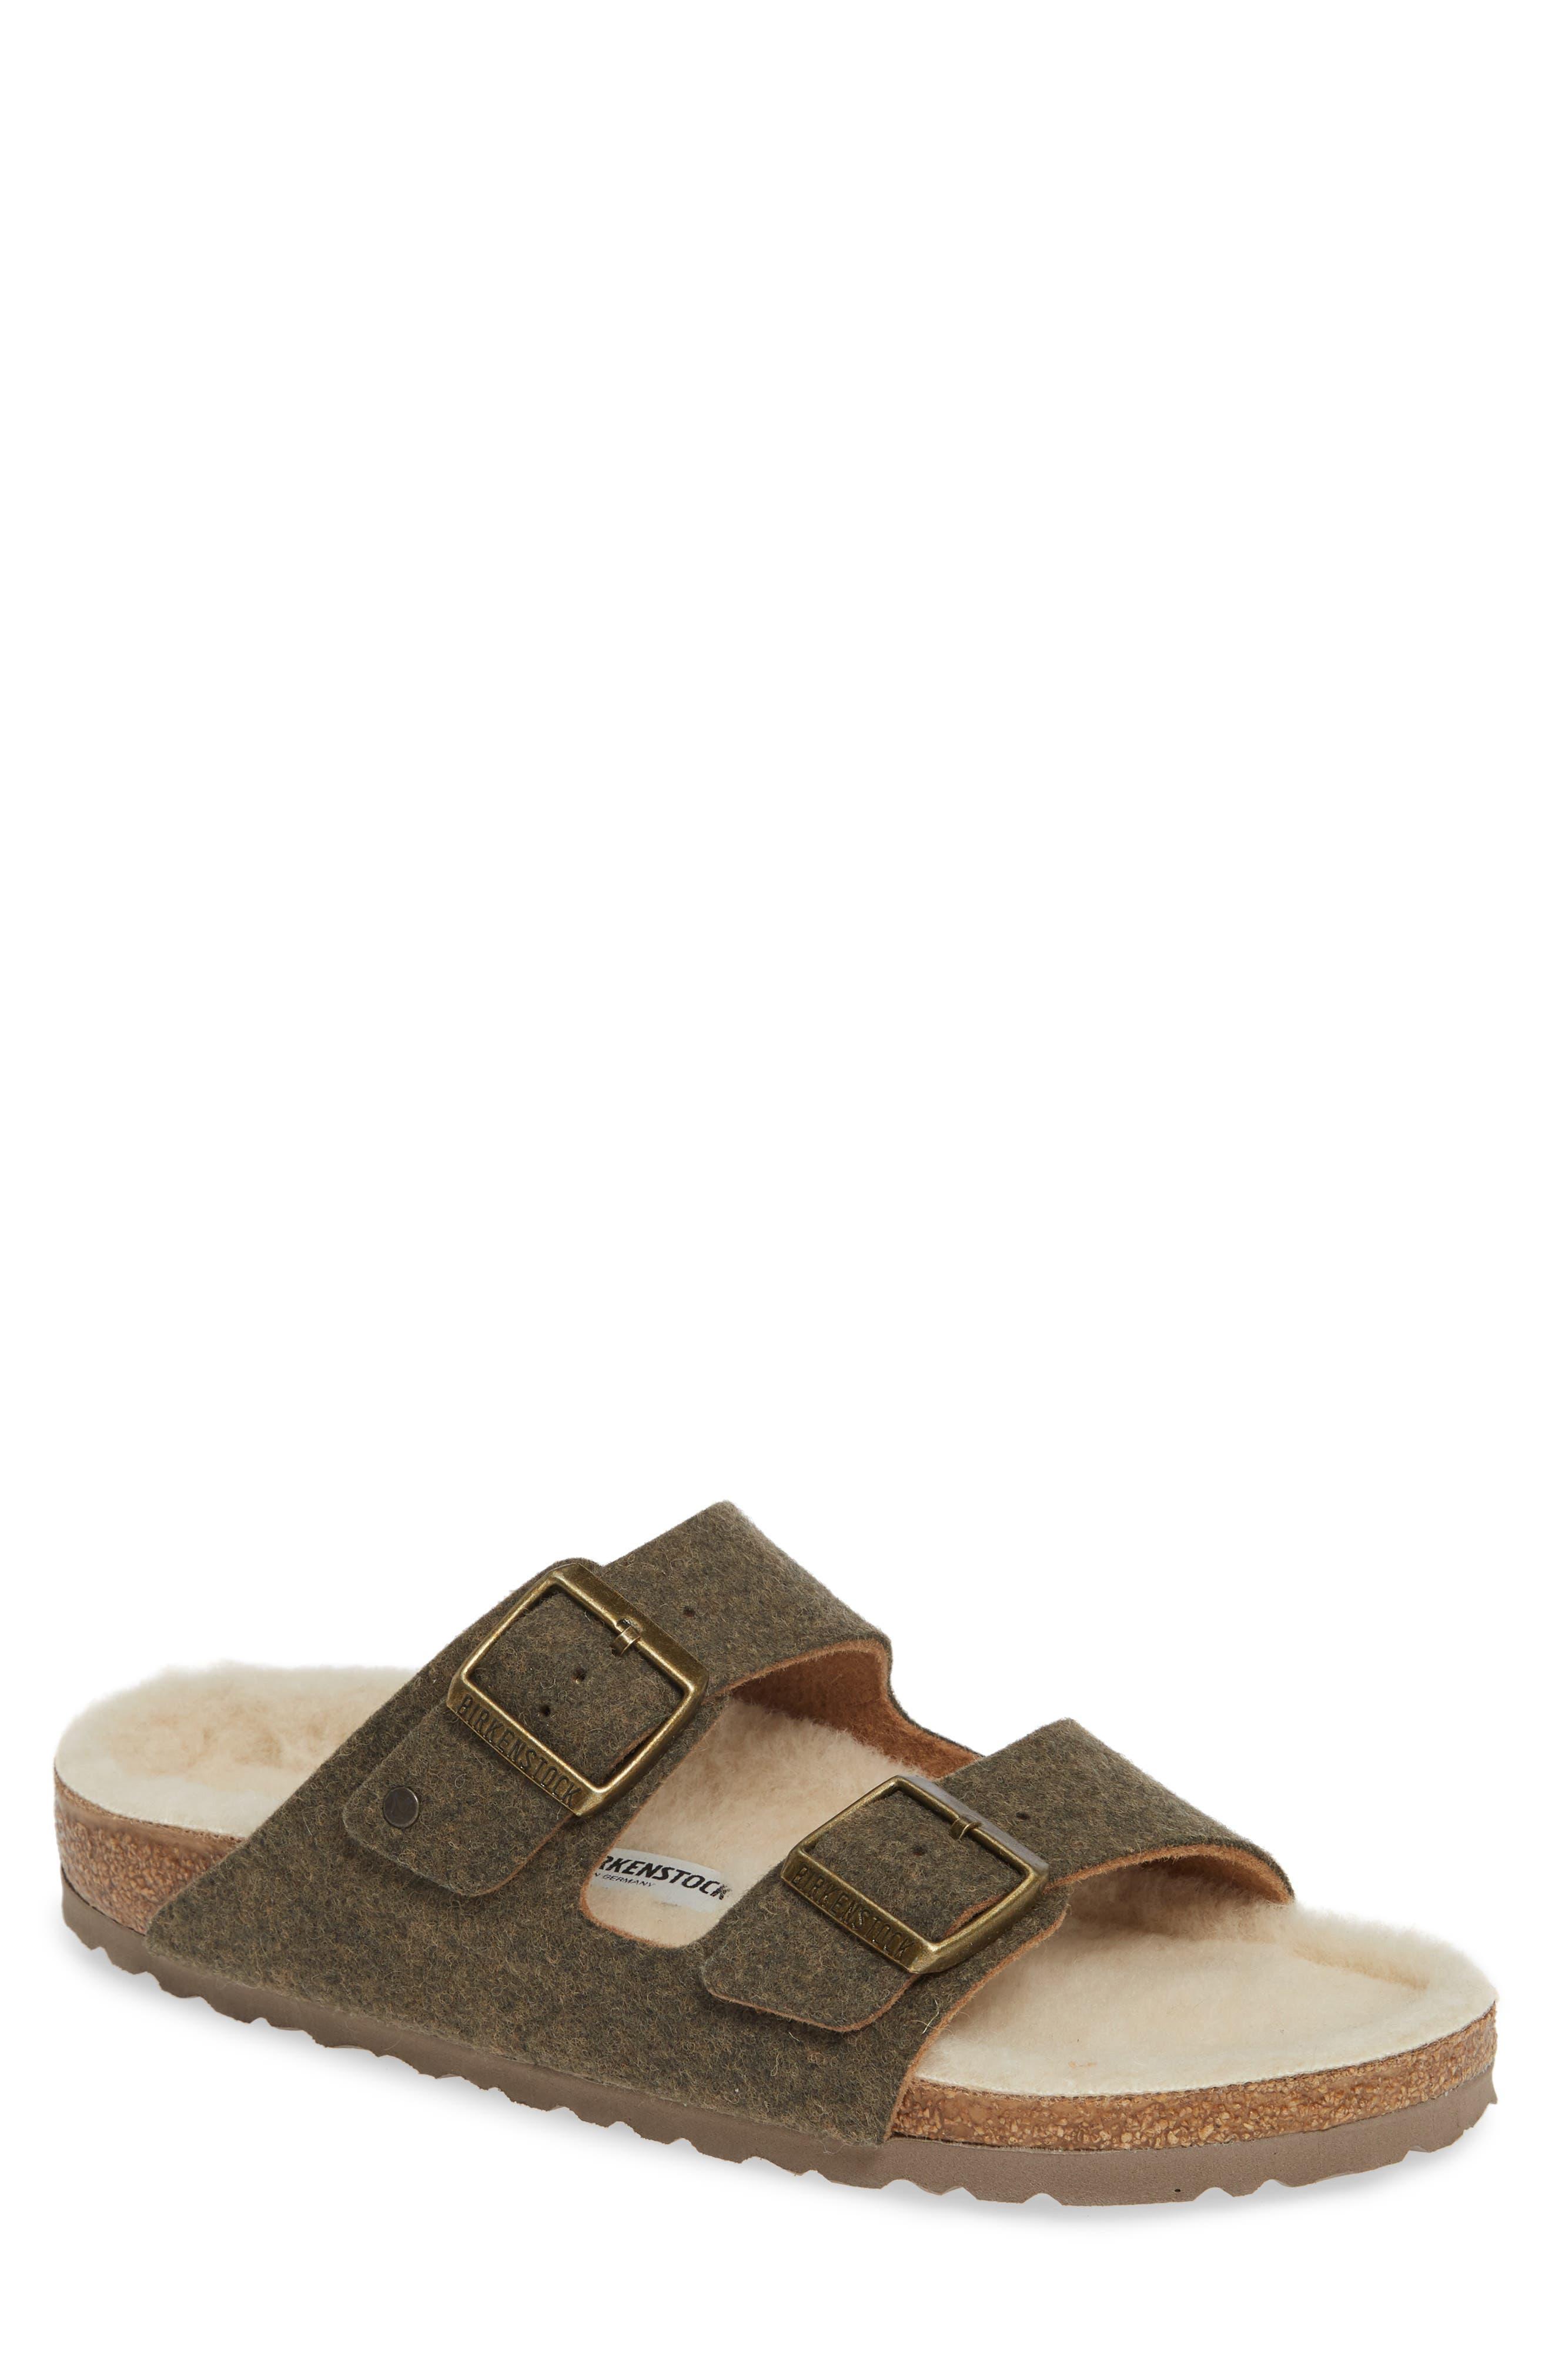 Birkenstock Arizona Slide Sandal With Faux Shearling,8.5 - Green